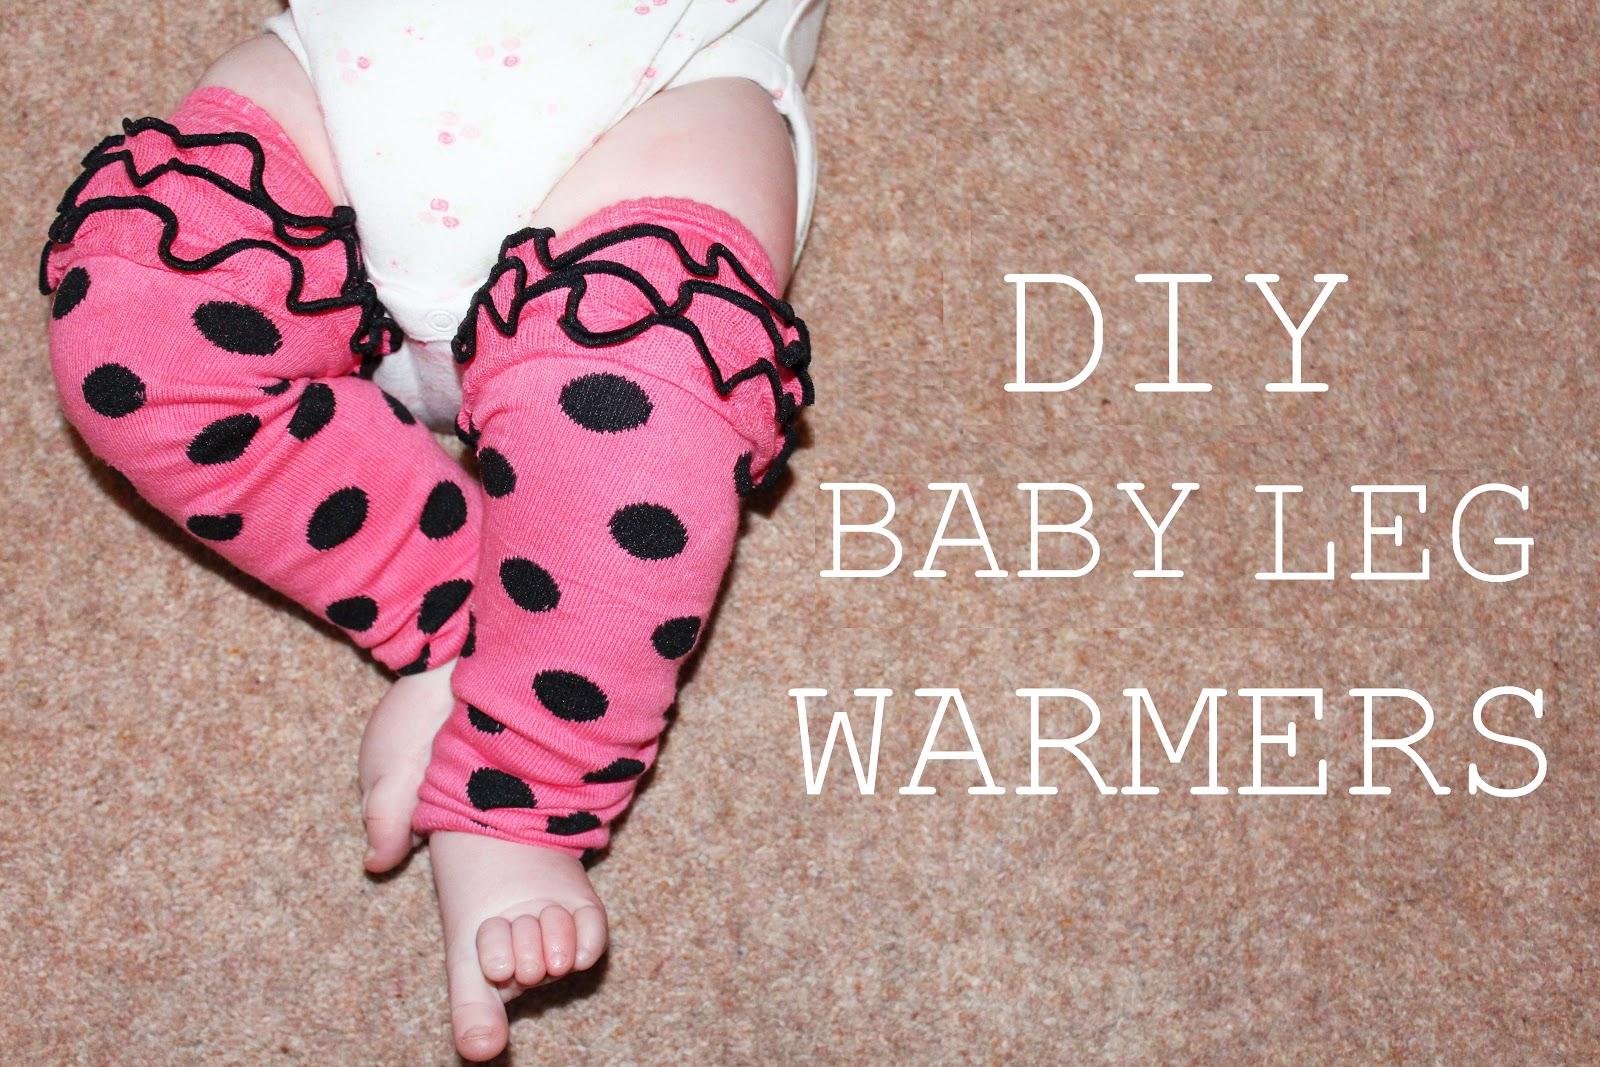 DIY Baby Leg Warmers - Oh So Amelia